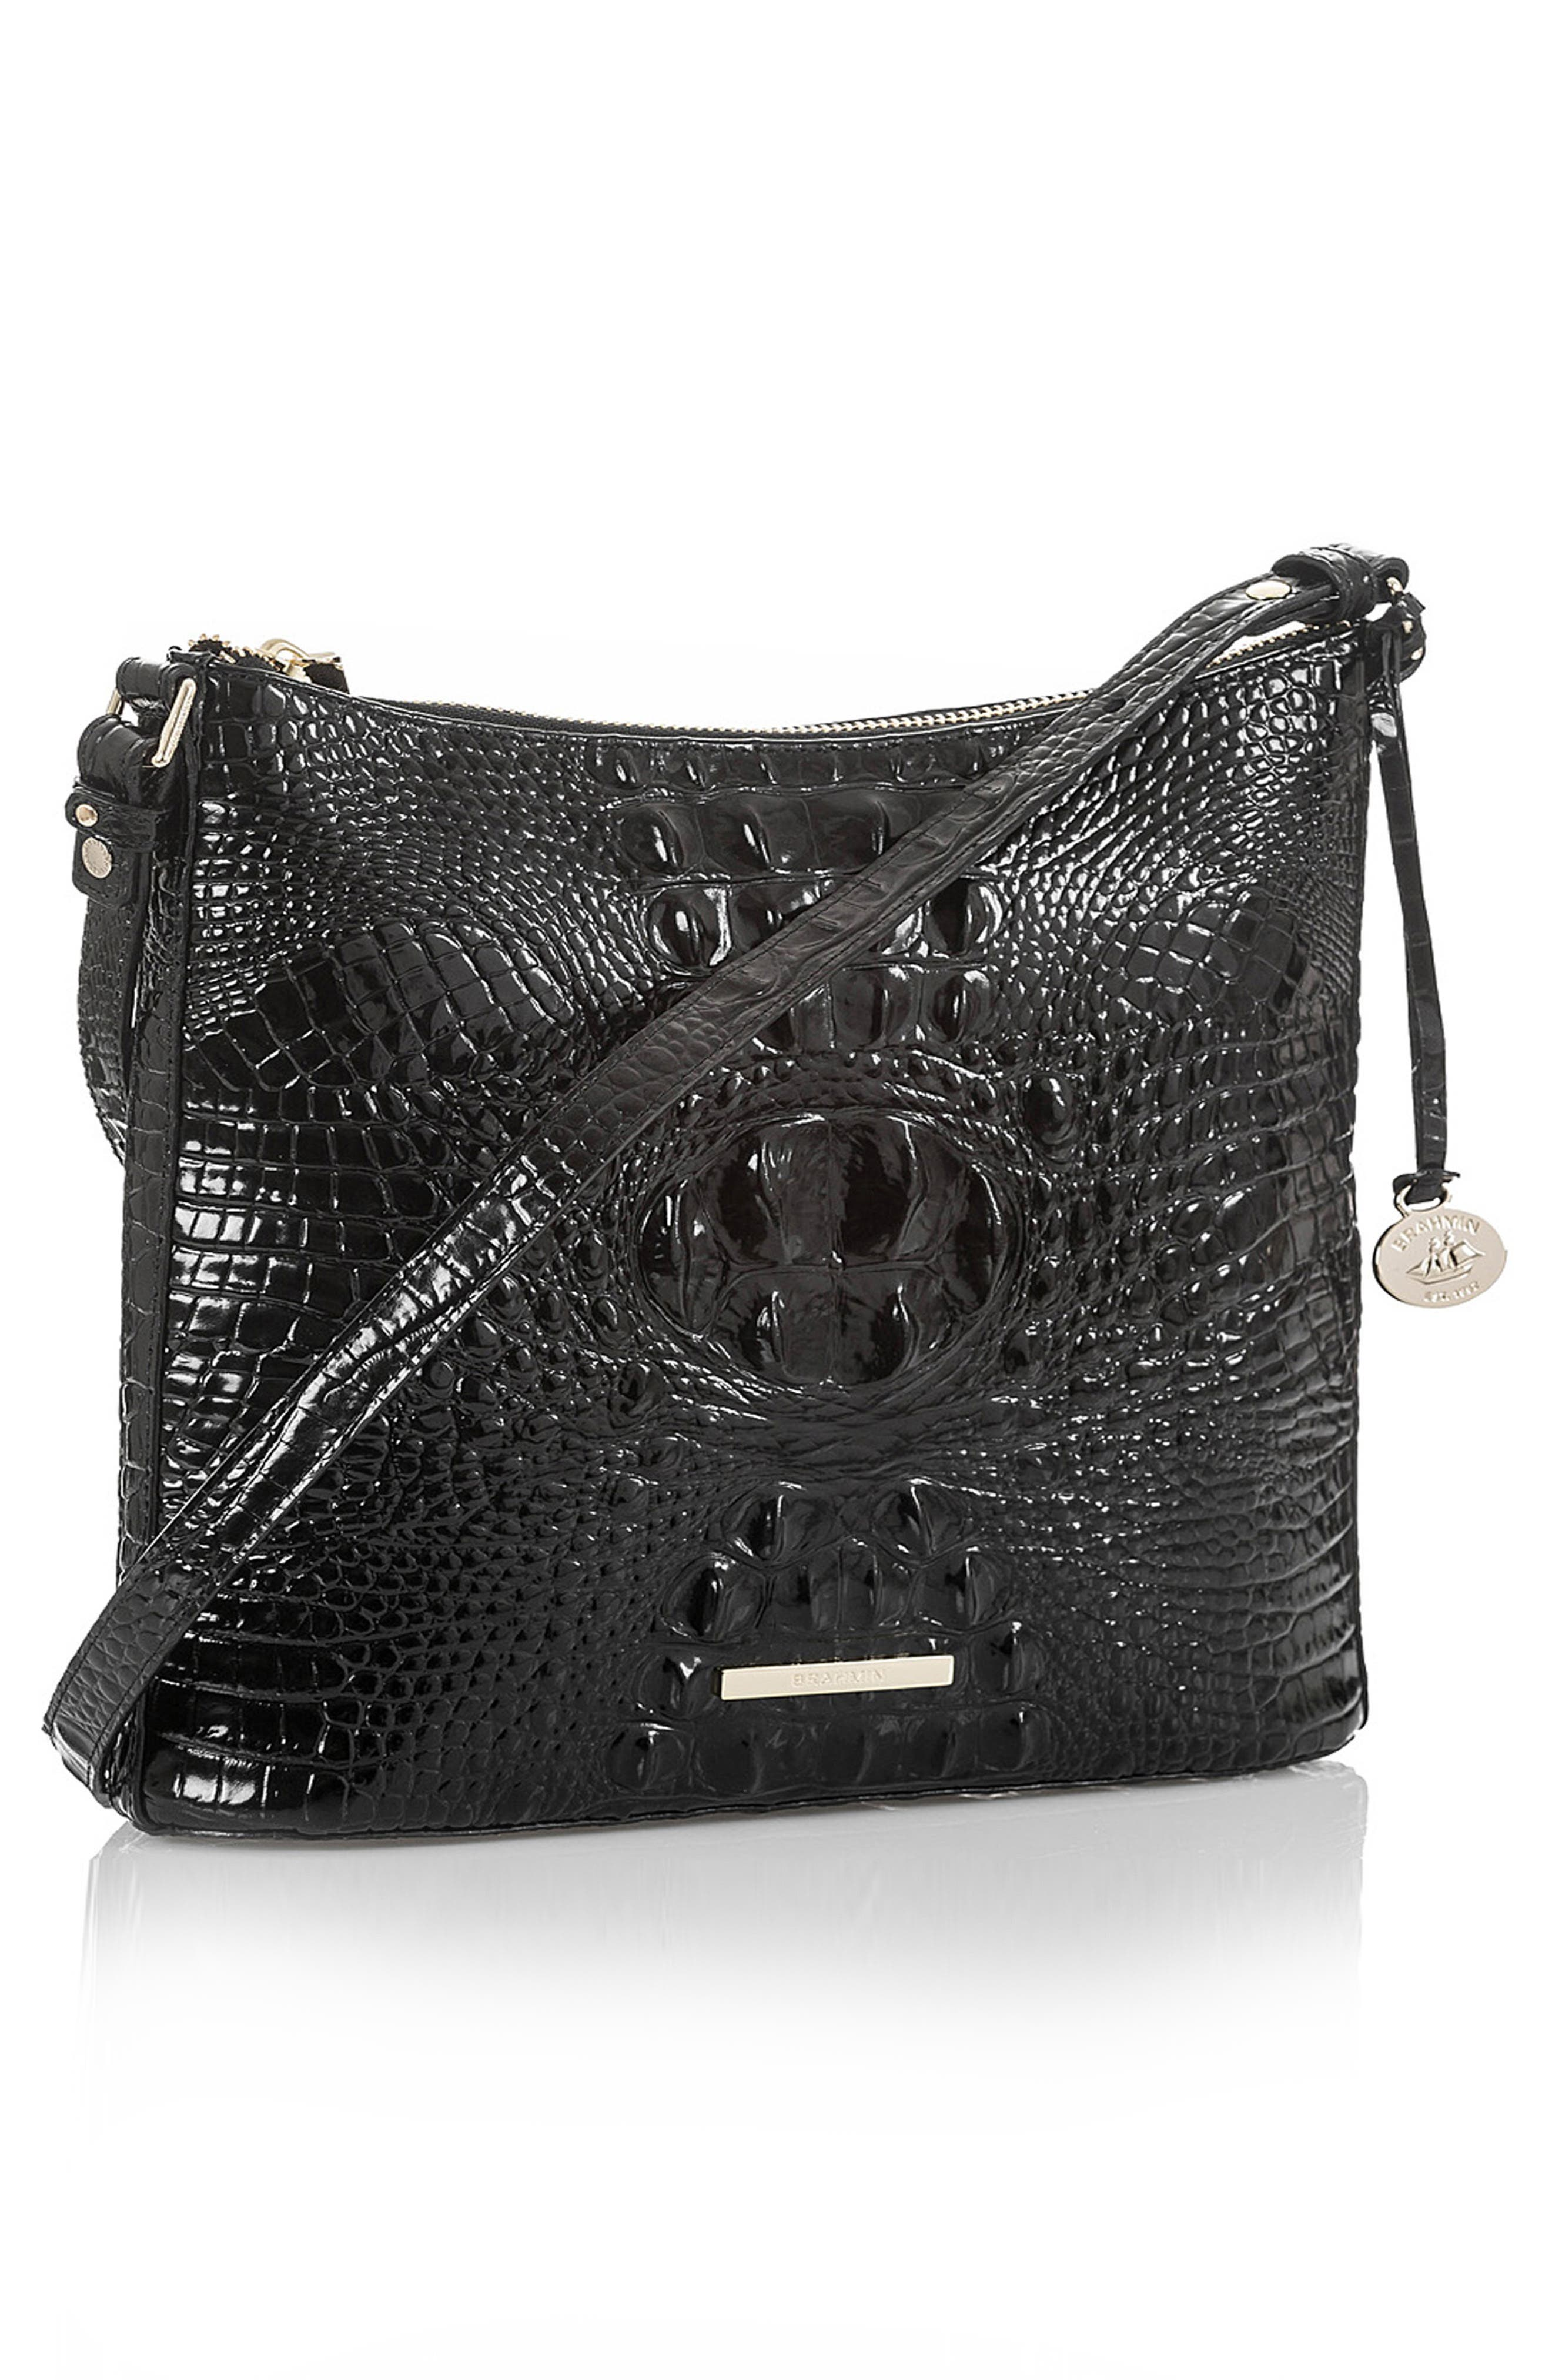 BRAHMIN, Katie Croc Embossed Leather Crossbody Bag, Alternate thumbnail 5, color, BLACK MEMBOURNE